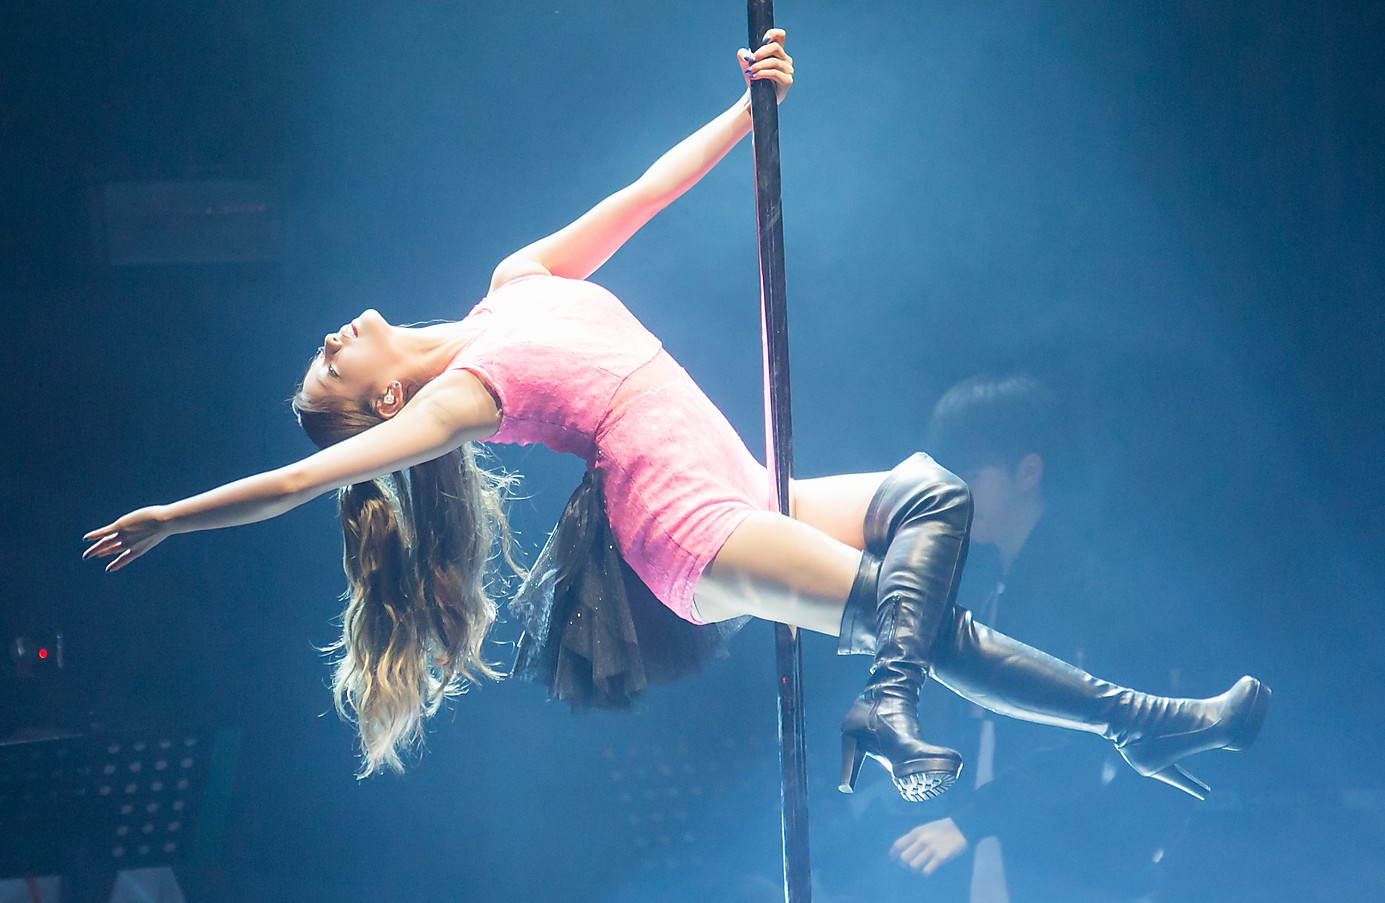 Pole dance - Wikipedia